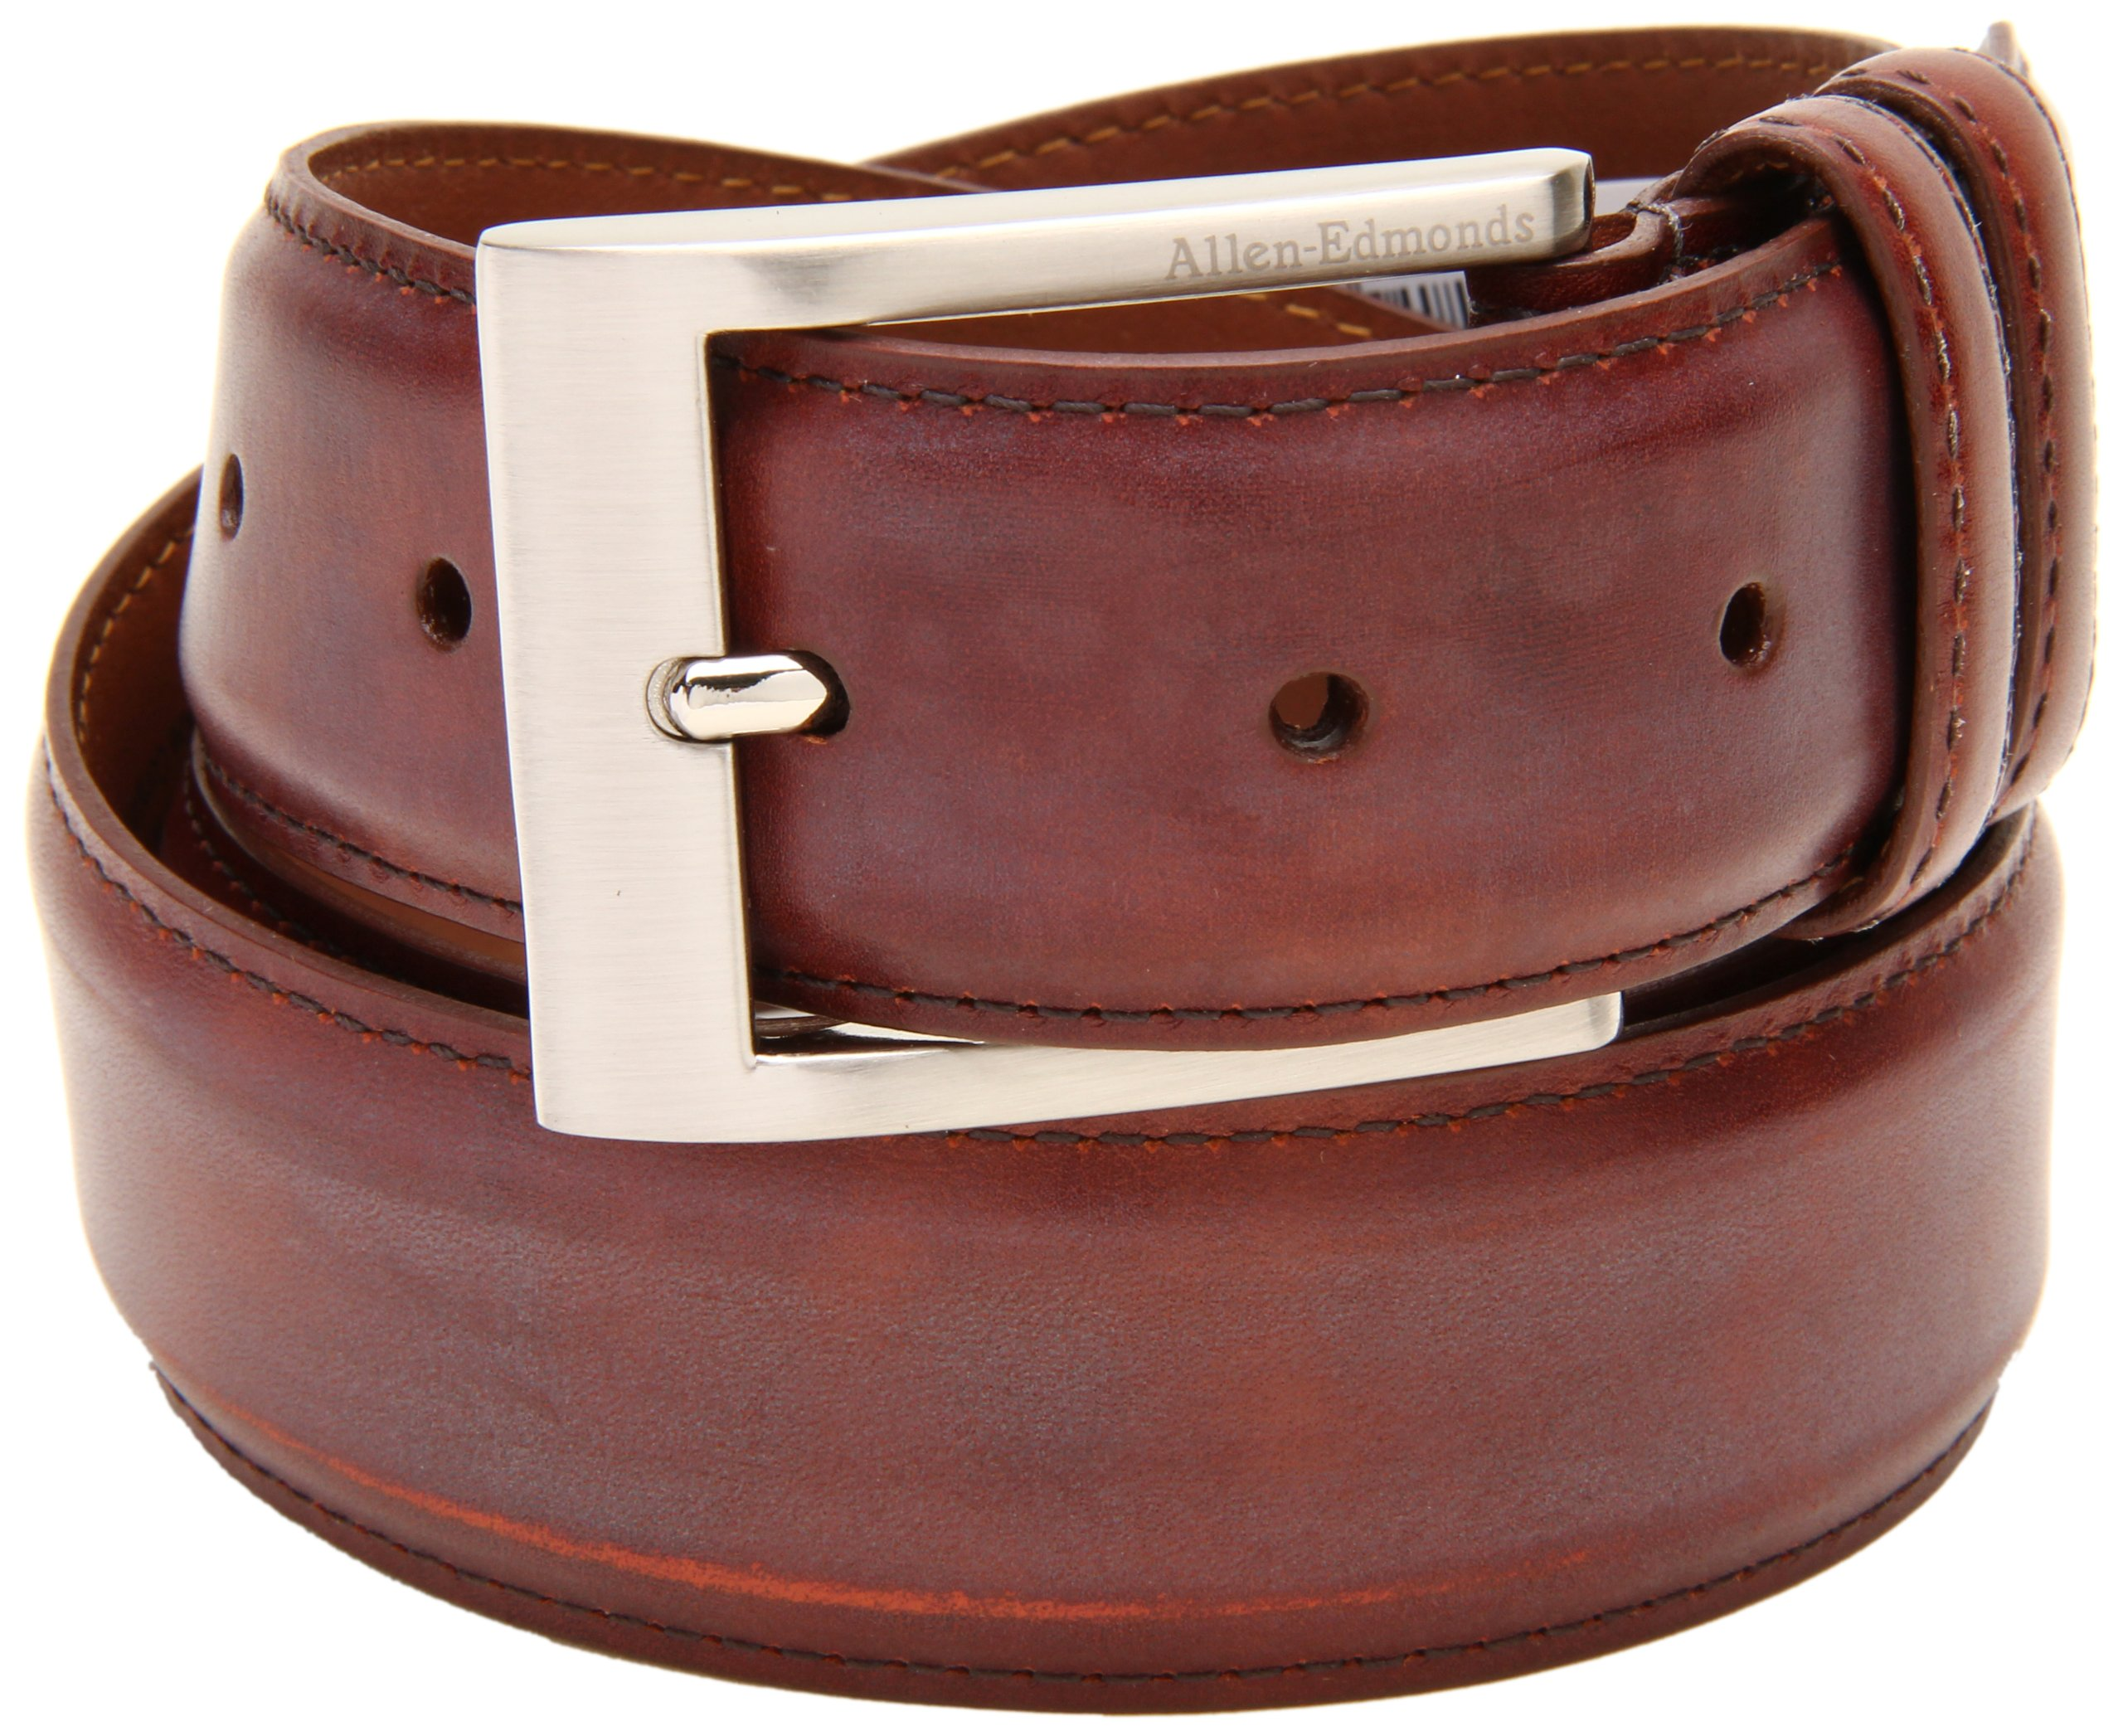 Allen Edmonds Men's Basic Wide Dress Belt, Chili, 36